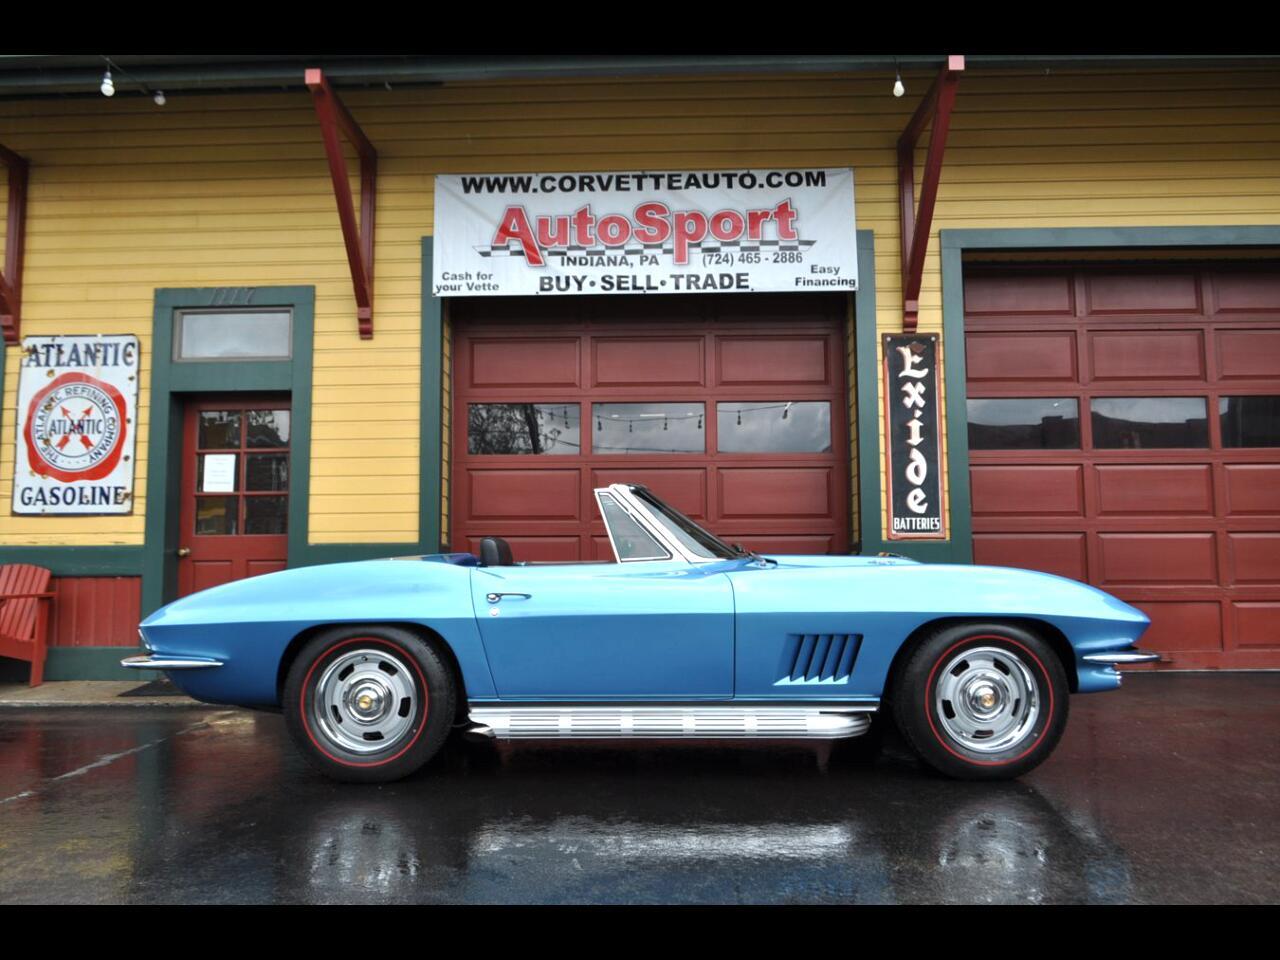 1967 Chevrolet Corvette 1967 Marina Blue Nut Bolt Frame Off Restored 435hp